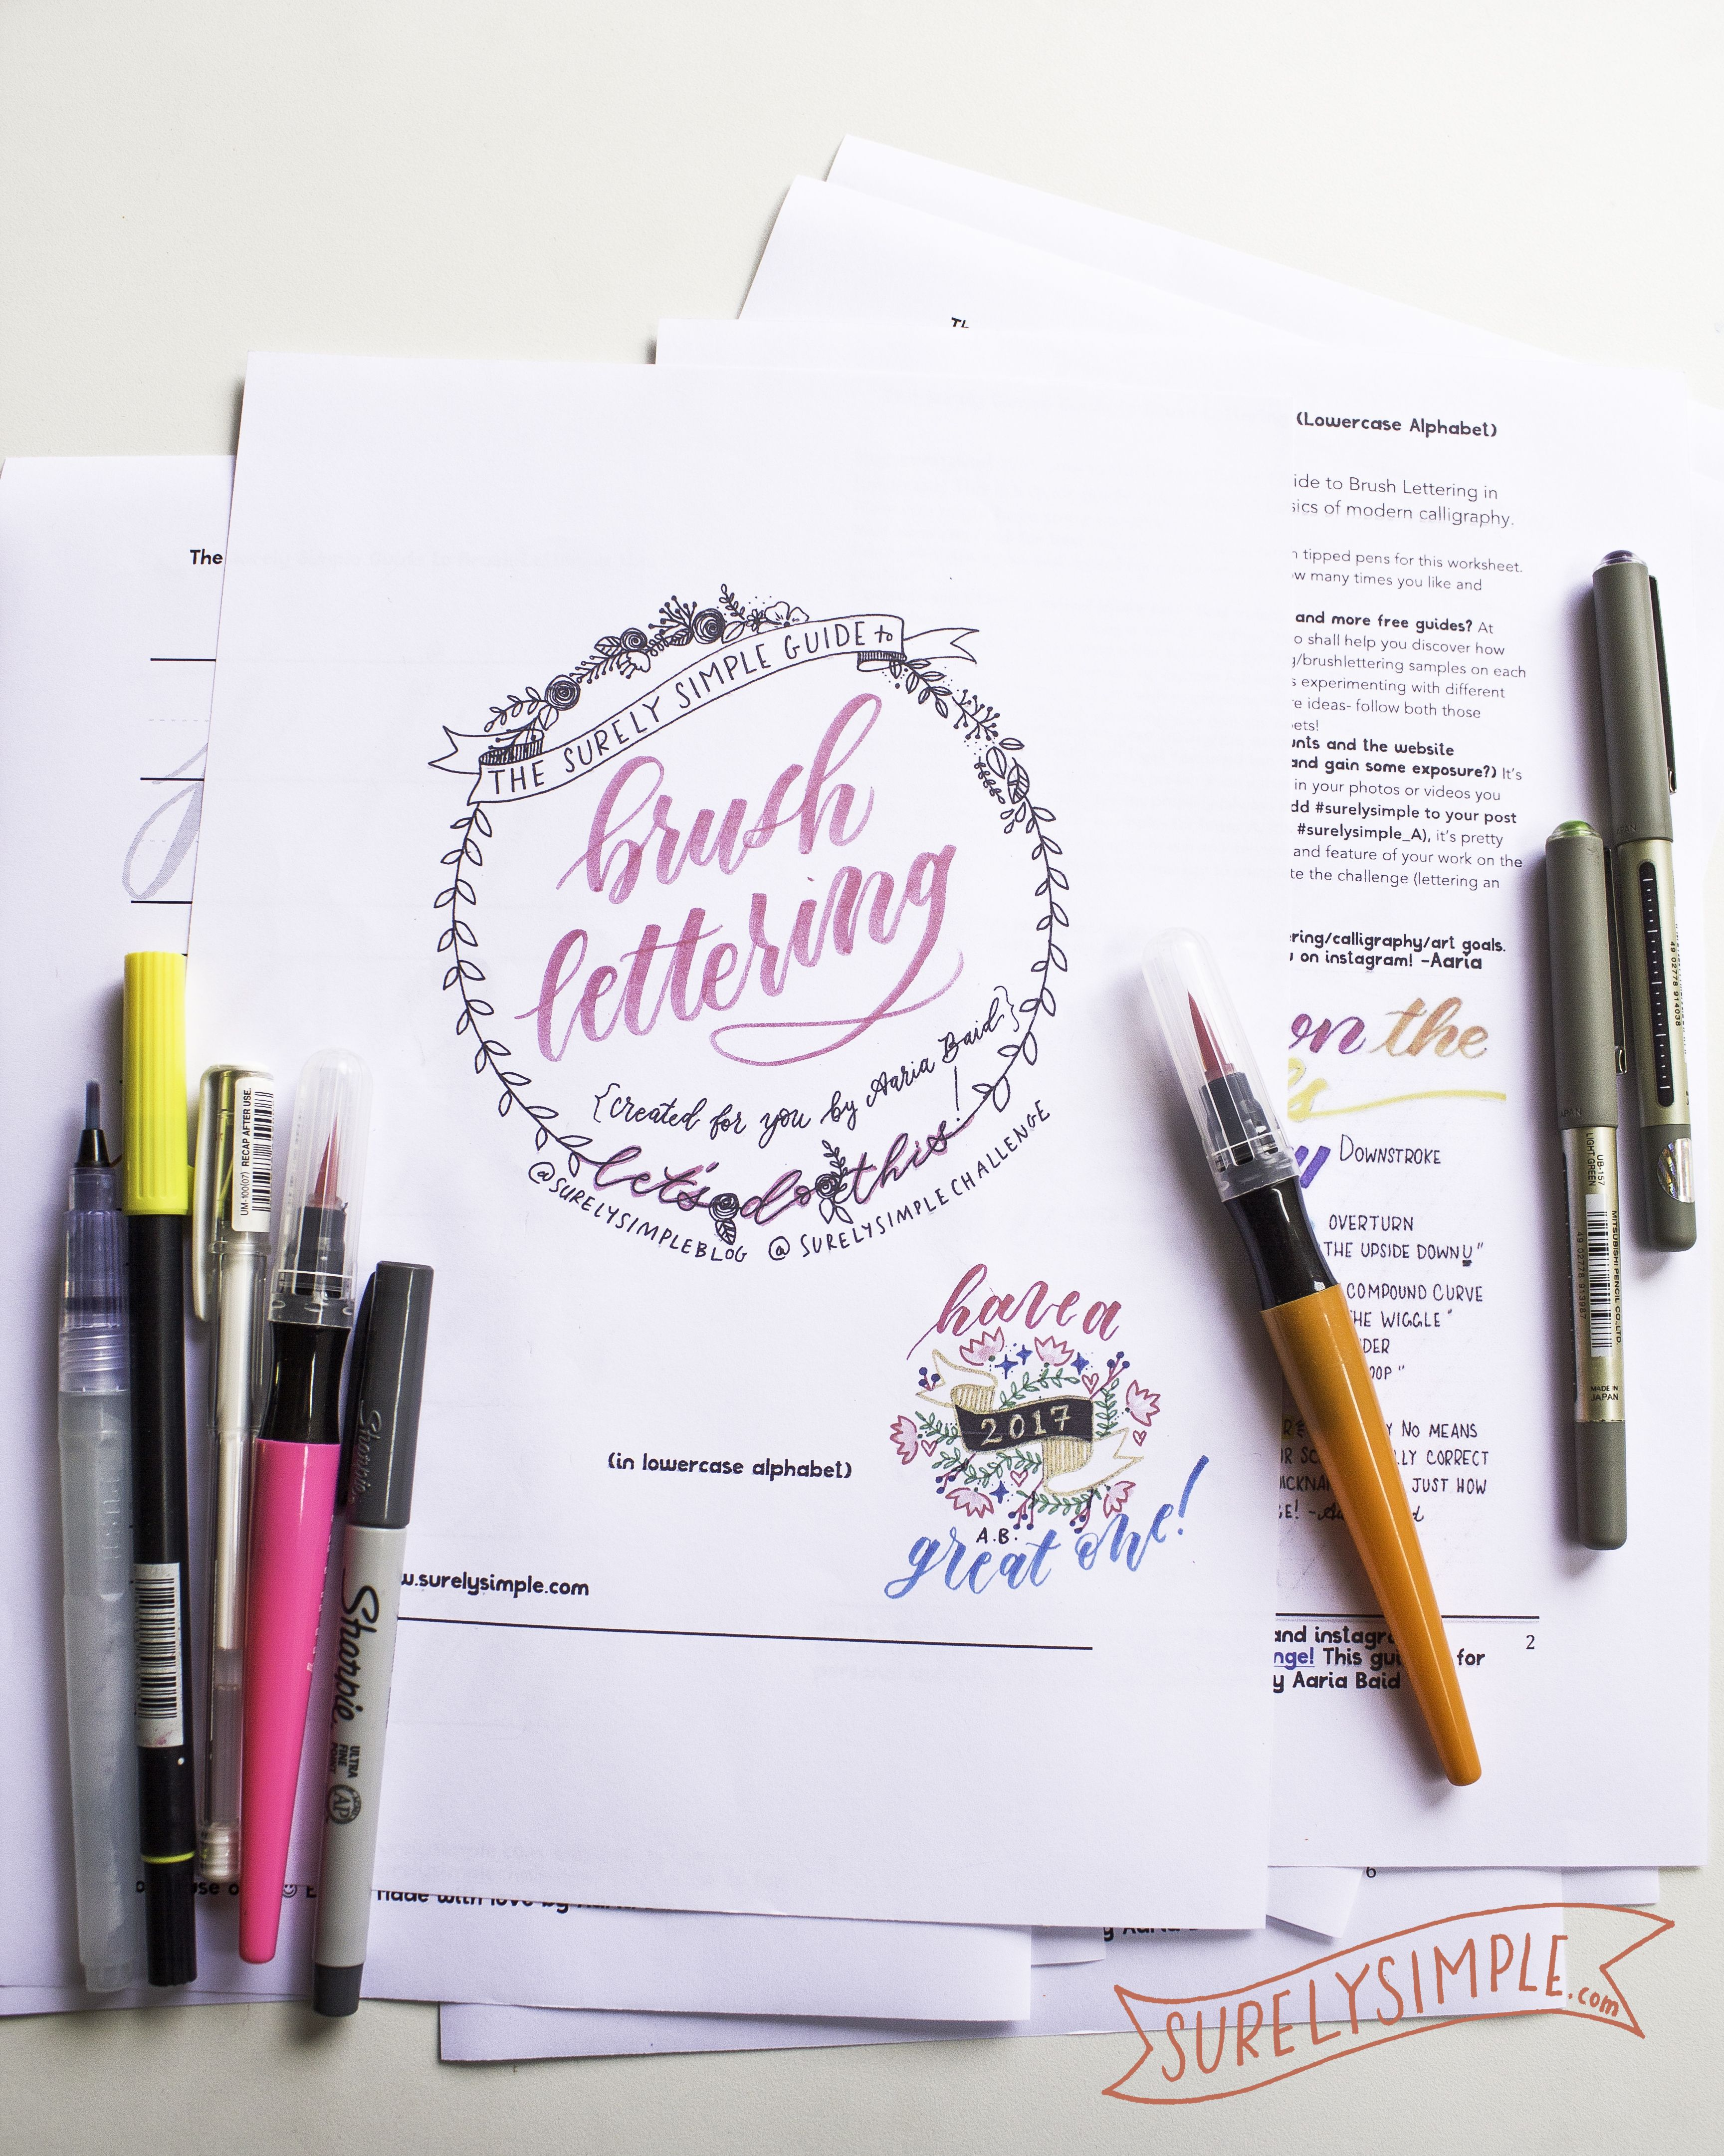 Free Brush Lettering Worksheet Download In Lowercase Via Surelysimple Com Instagram Instagra Brush Lettering Worksheet Brush Pen Lettering Brush Lettering [ 4323 x 3456 Pixel ]